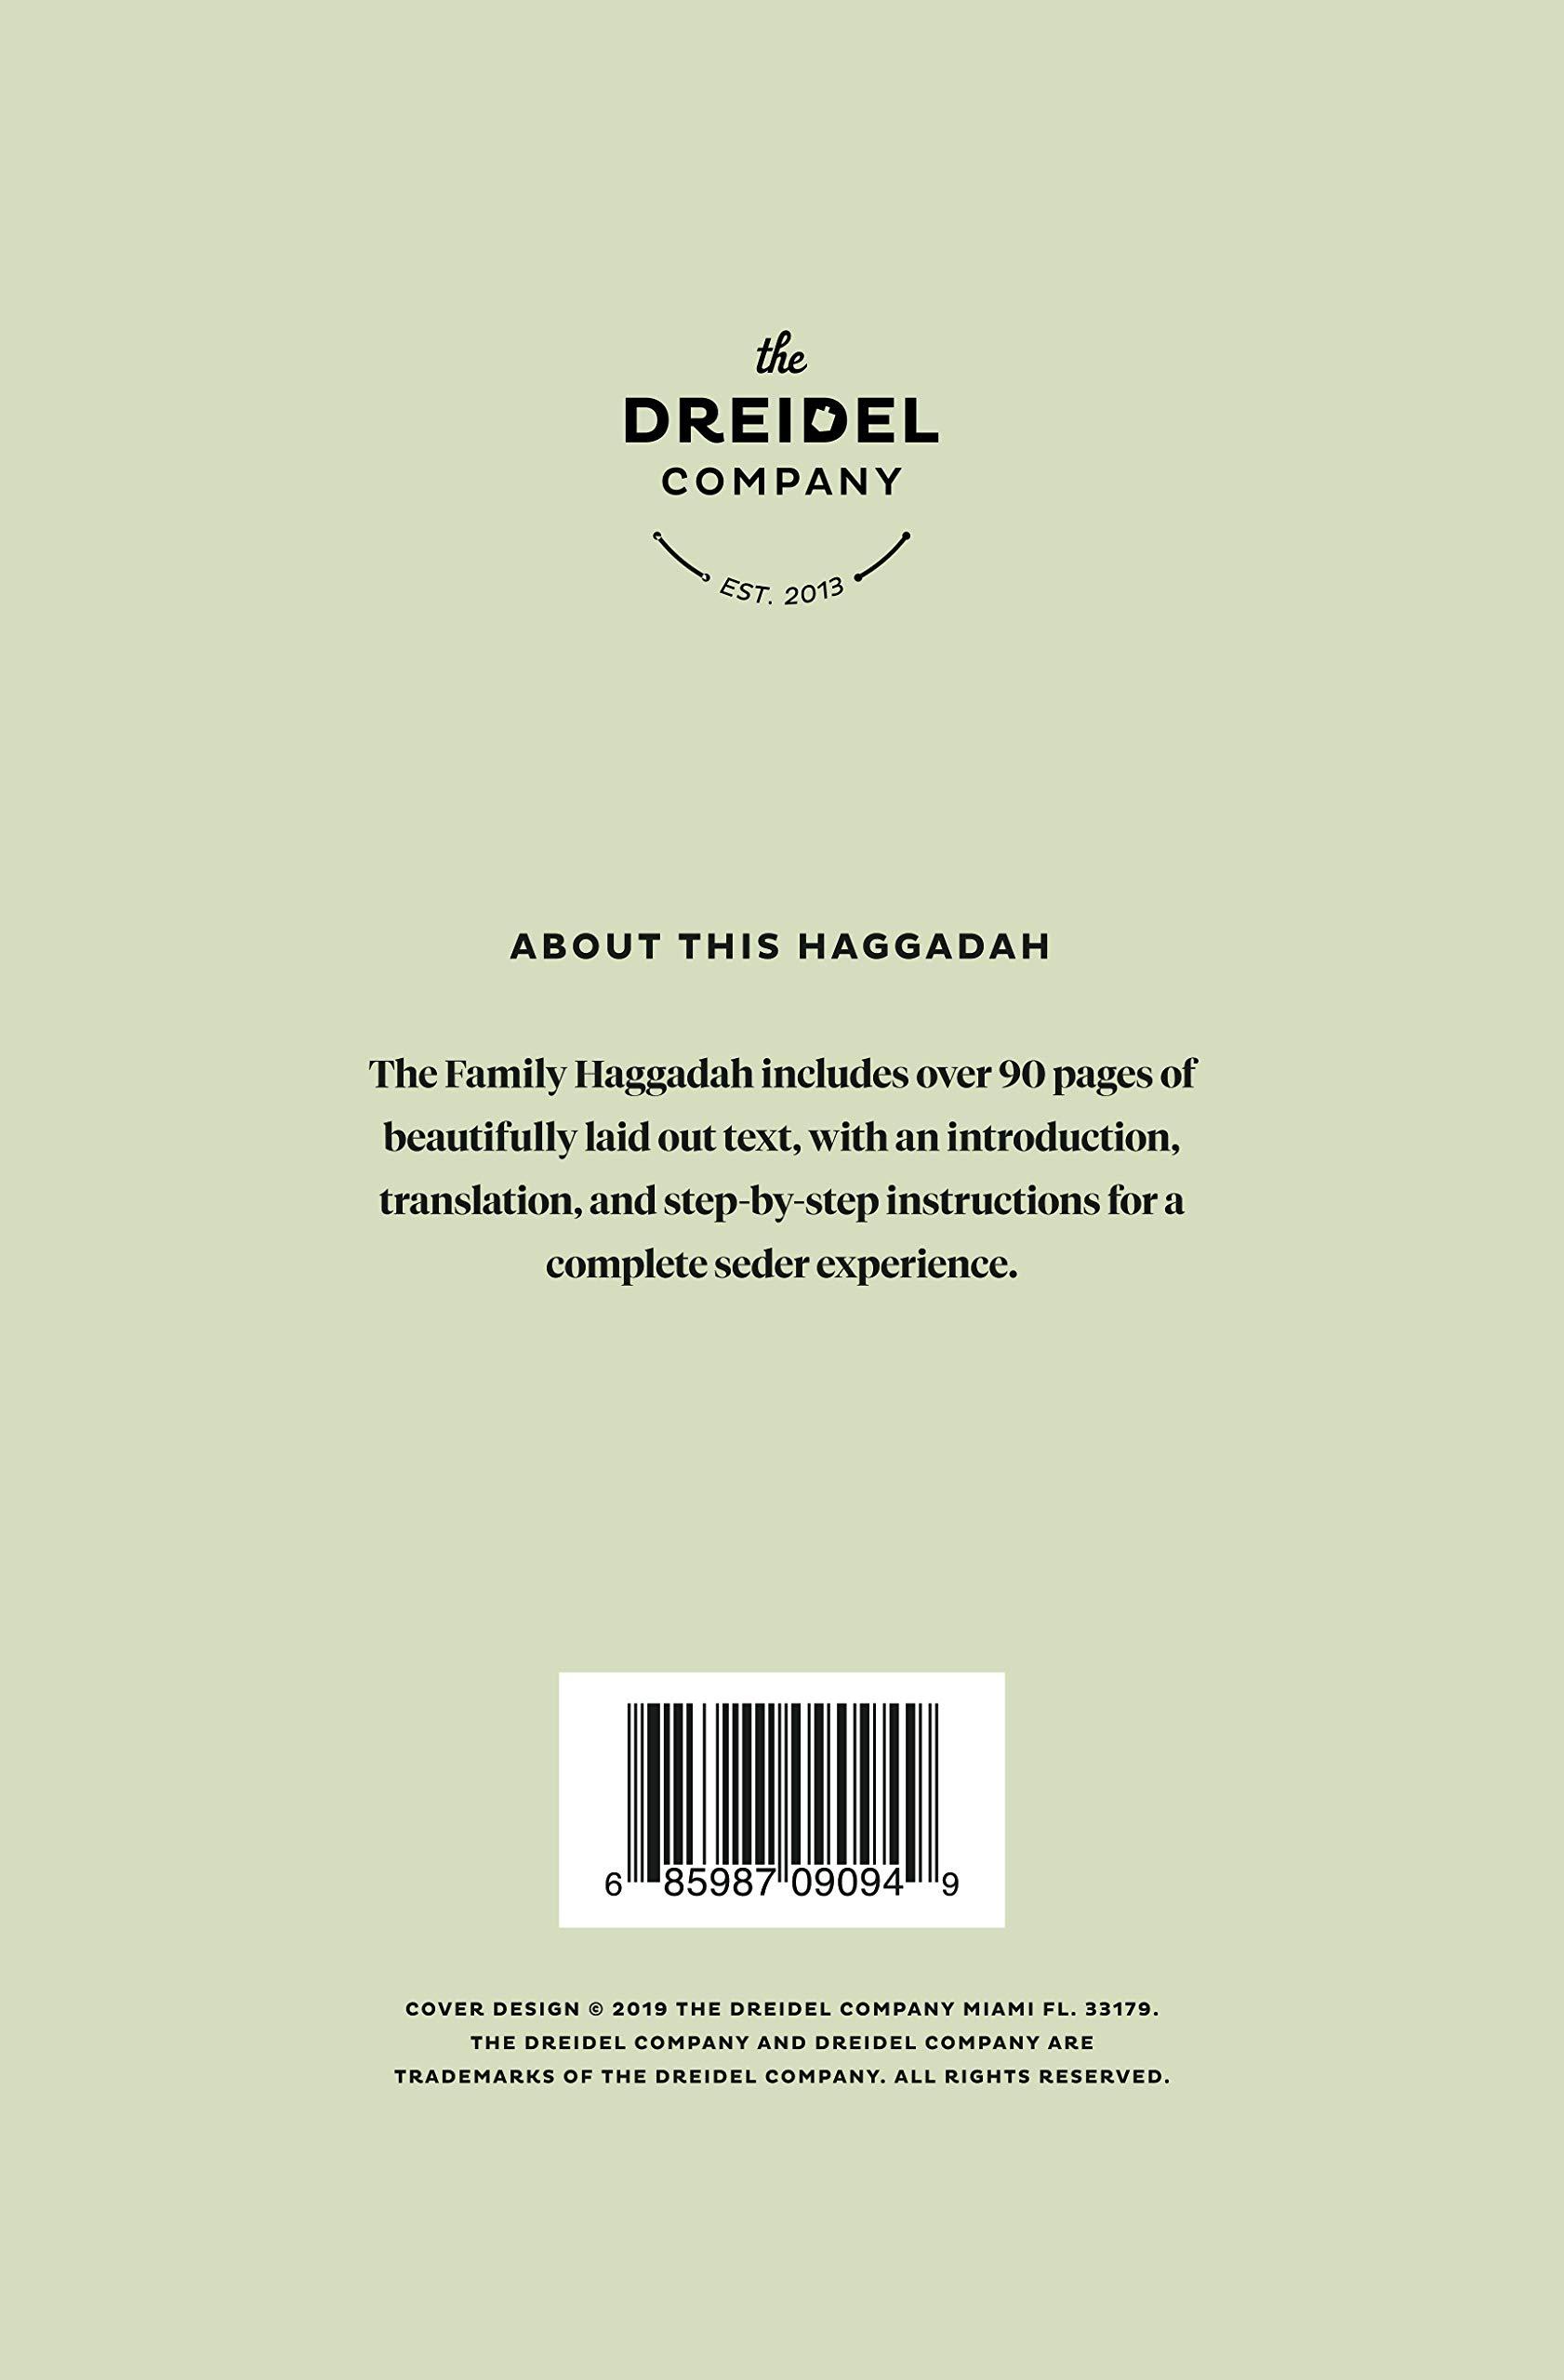 The Family Haggadah Passover Handbook Guide (Family Haggadah, Set of 10) by The Dreidel Company (Image #3)